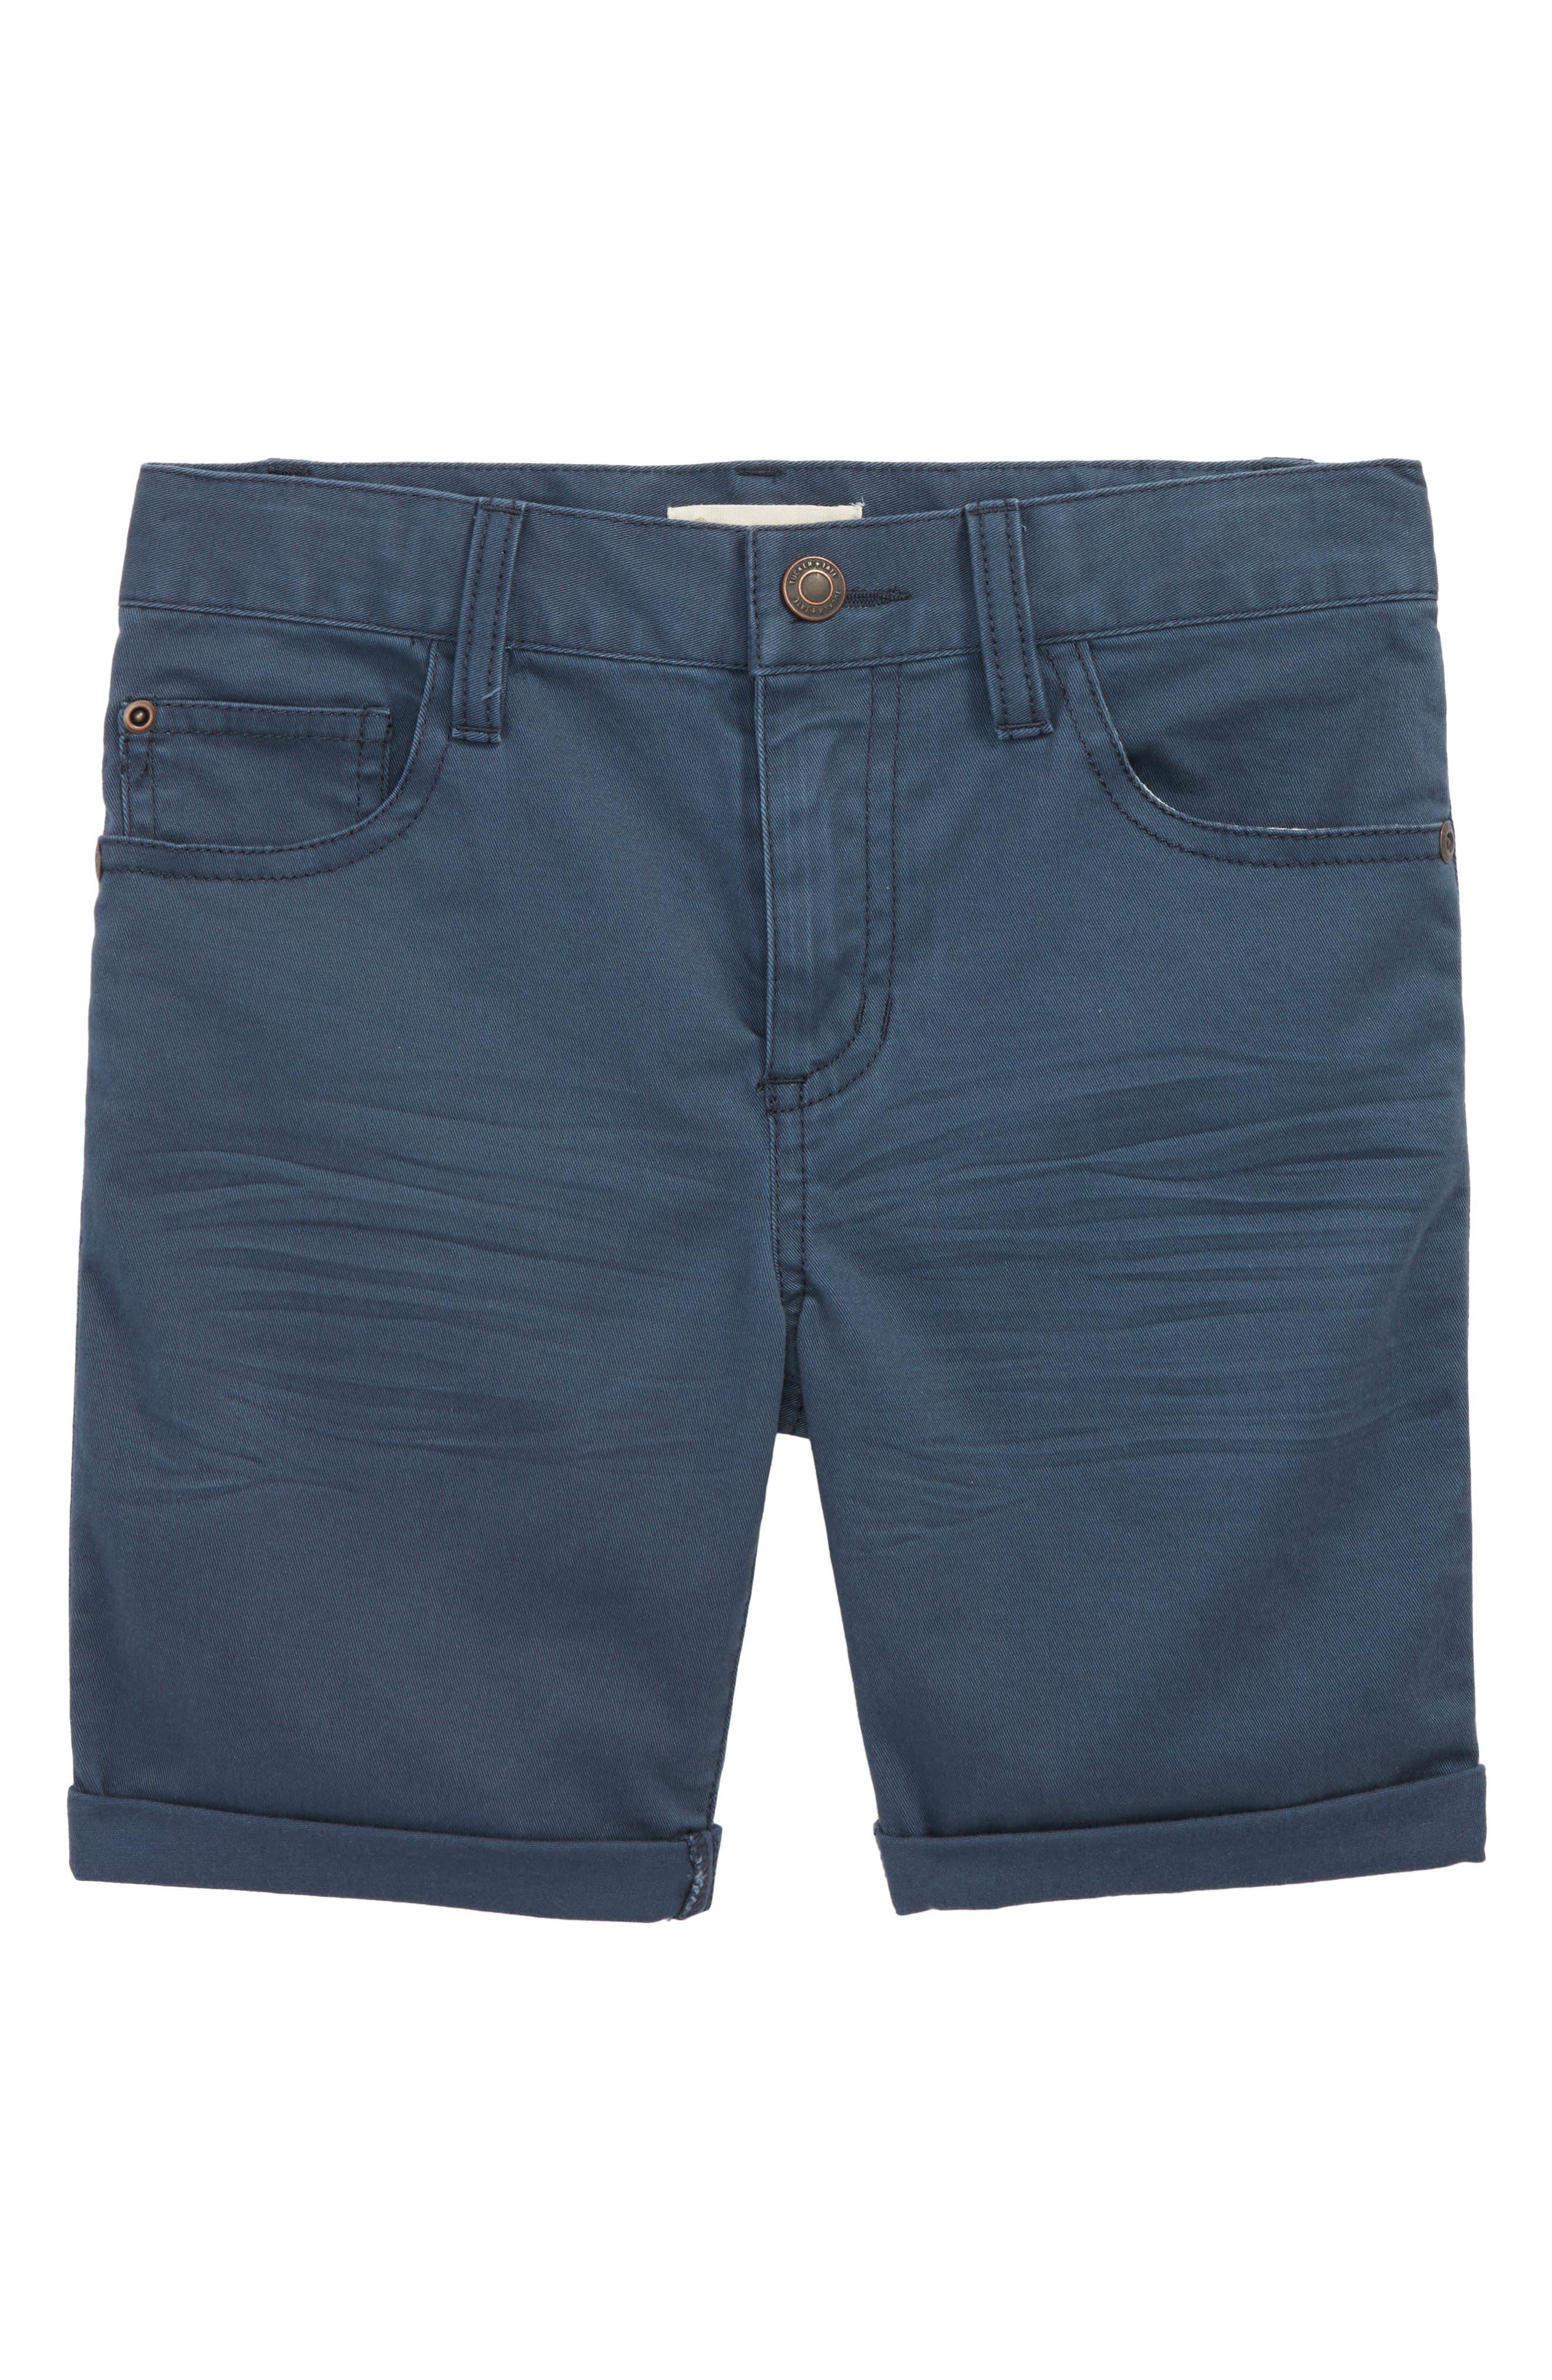 Tucker + Tate Stretch Twill Shorts (Toddler Boys & Little Boys)